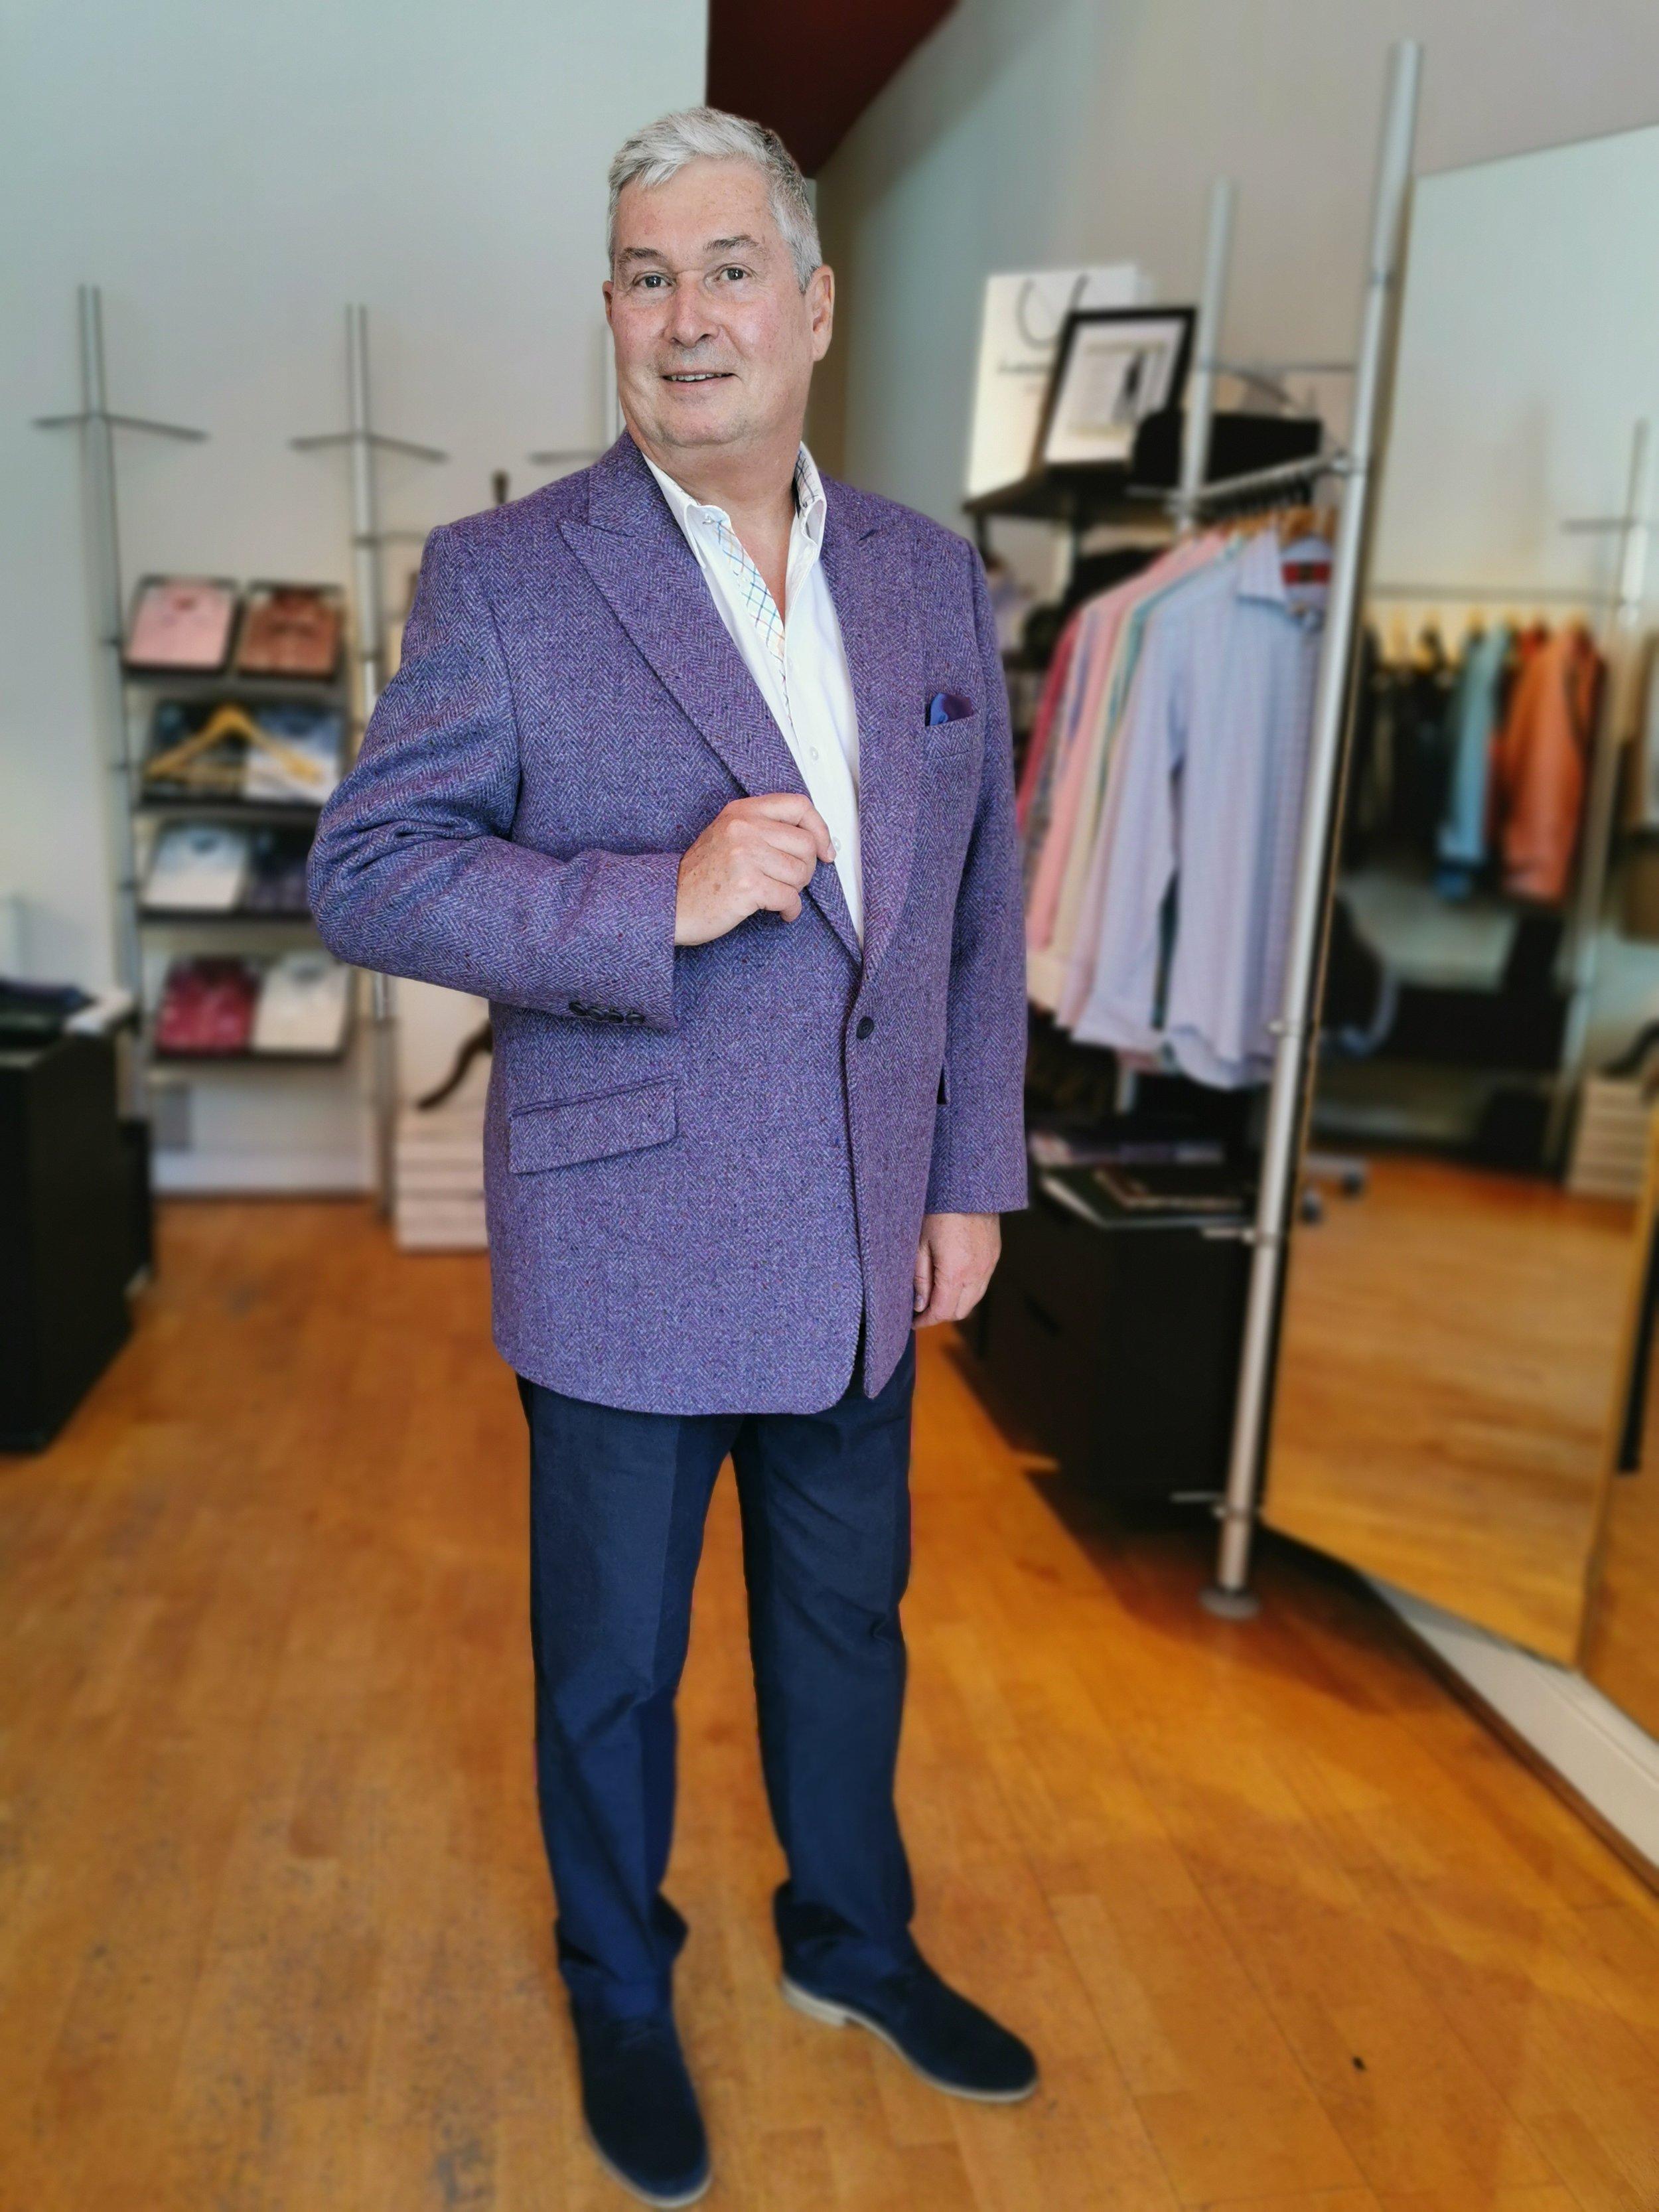 purple-tweed-woven-in-bone-handwoven-bespoke-susannah-hall-jacket-made-uk-british.jpg